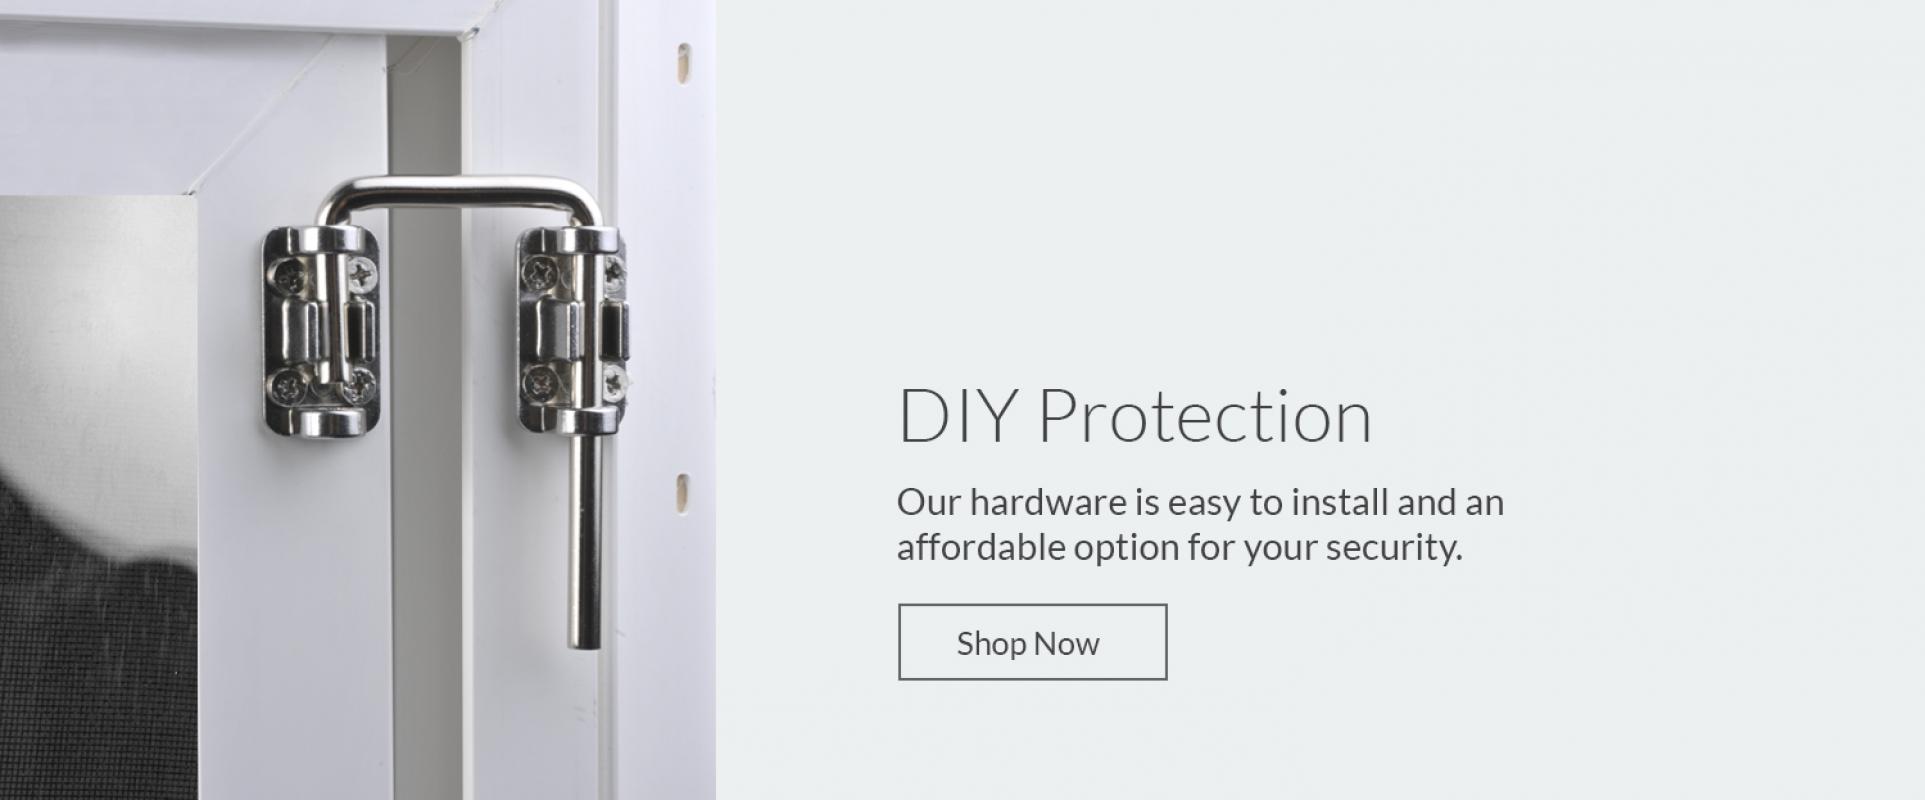 Door Security Hardware Photos Wall And Door Tinfishclematis